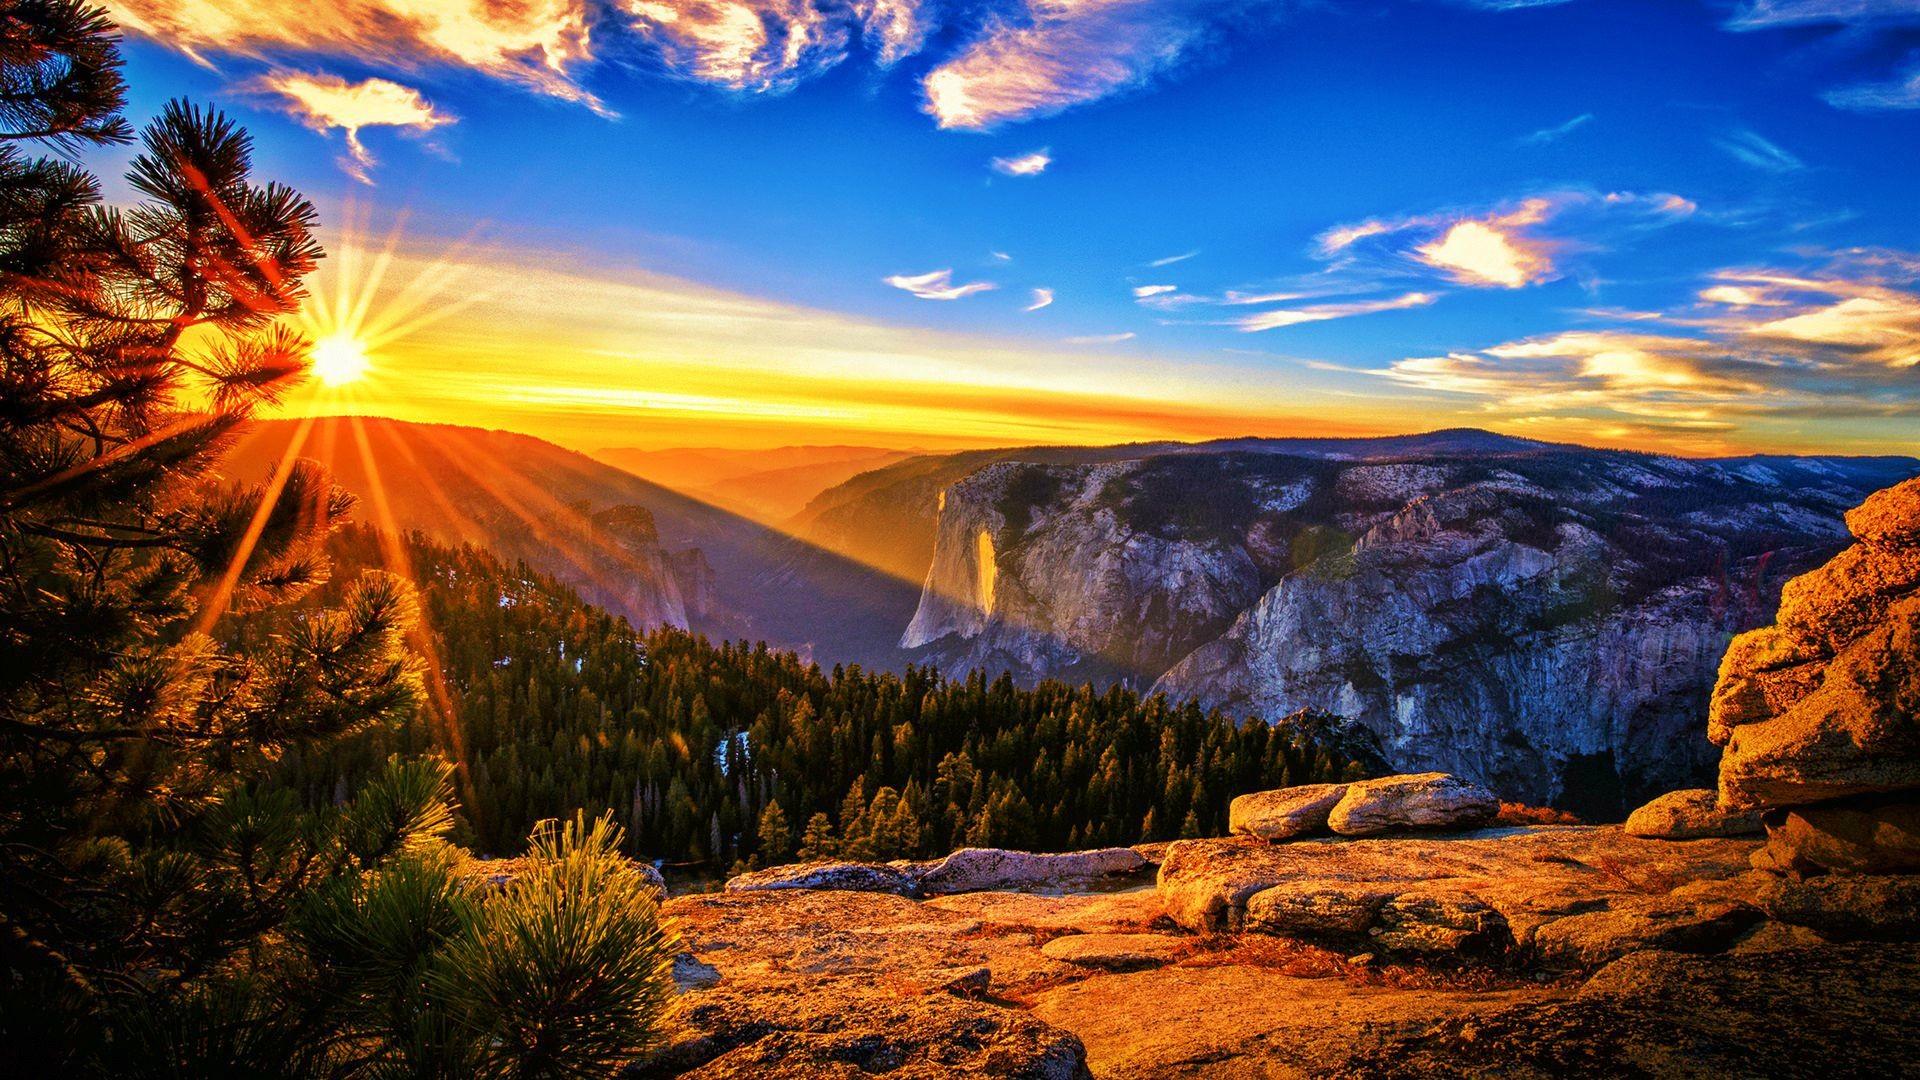 beautiful sunrise wallpaper (58+ images)